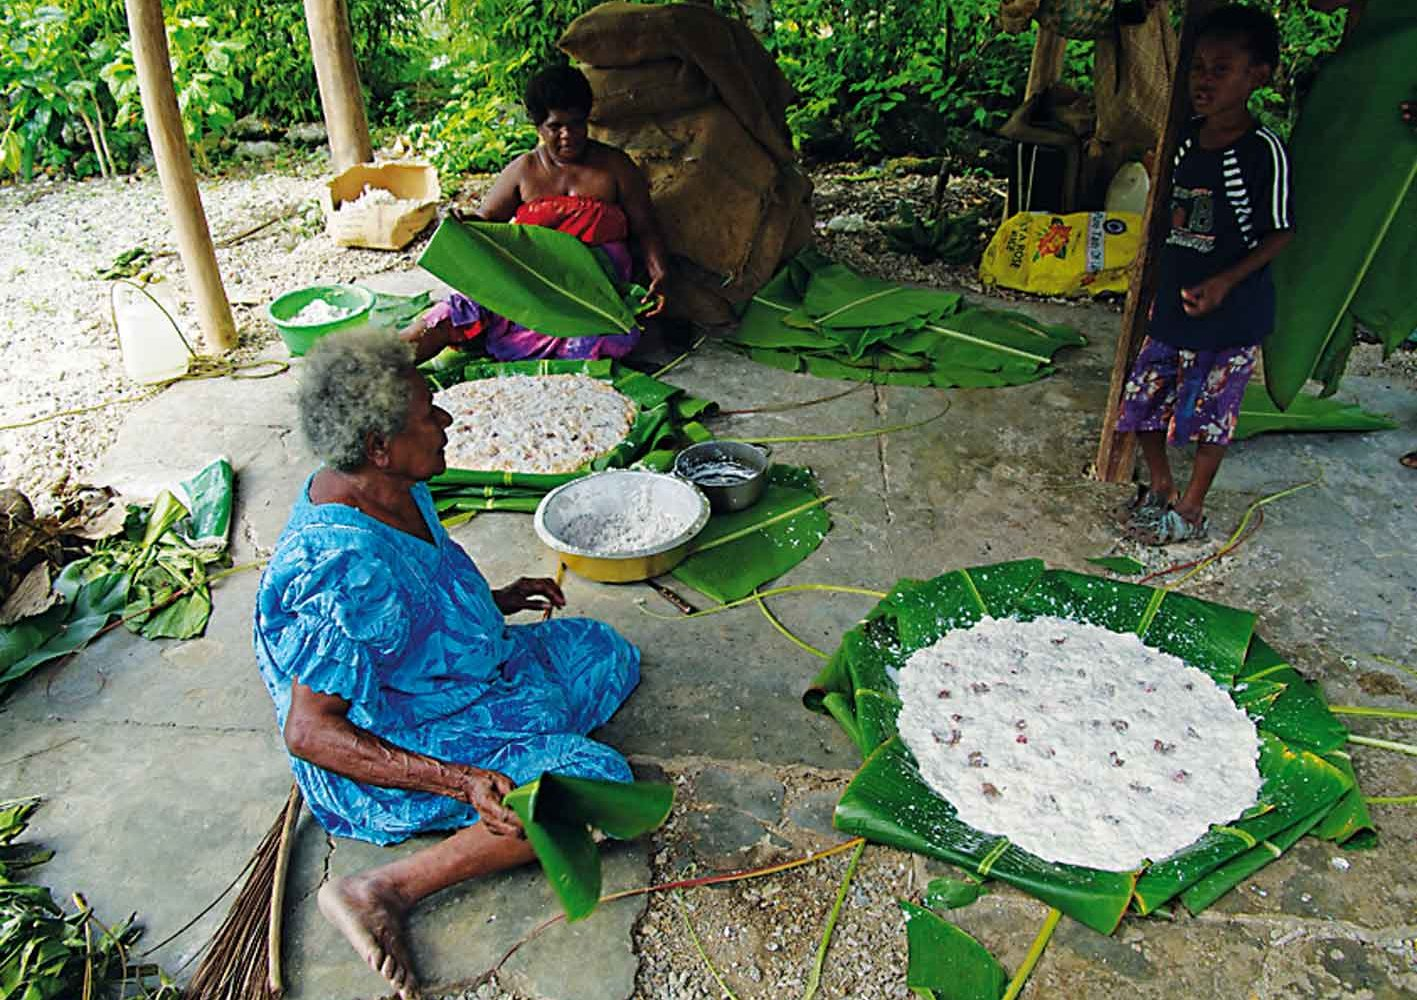 Traditionelle Essenszubereitung auf Vanautu